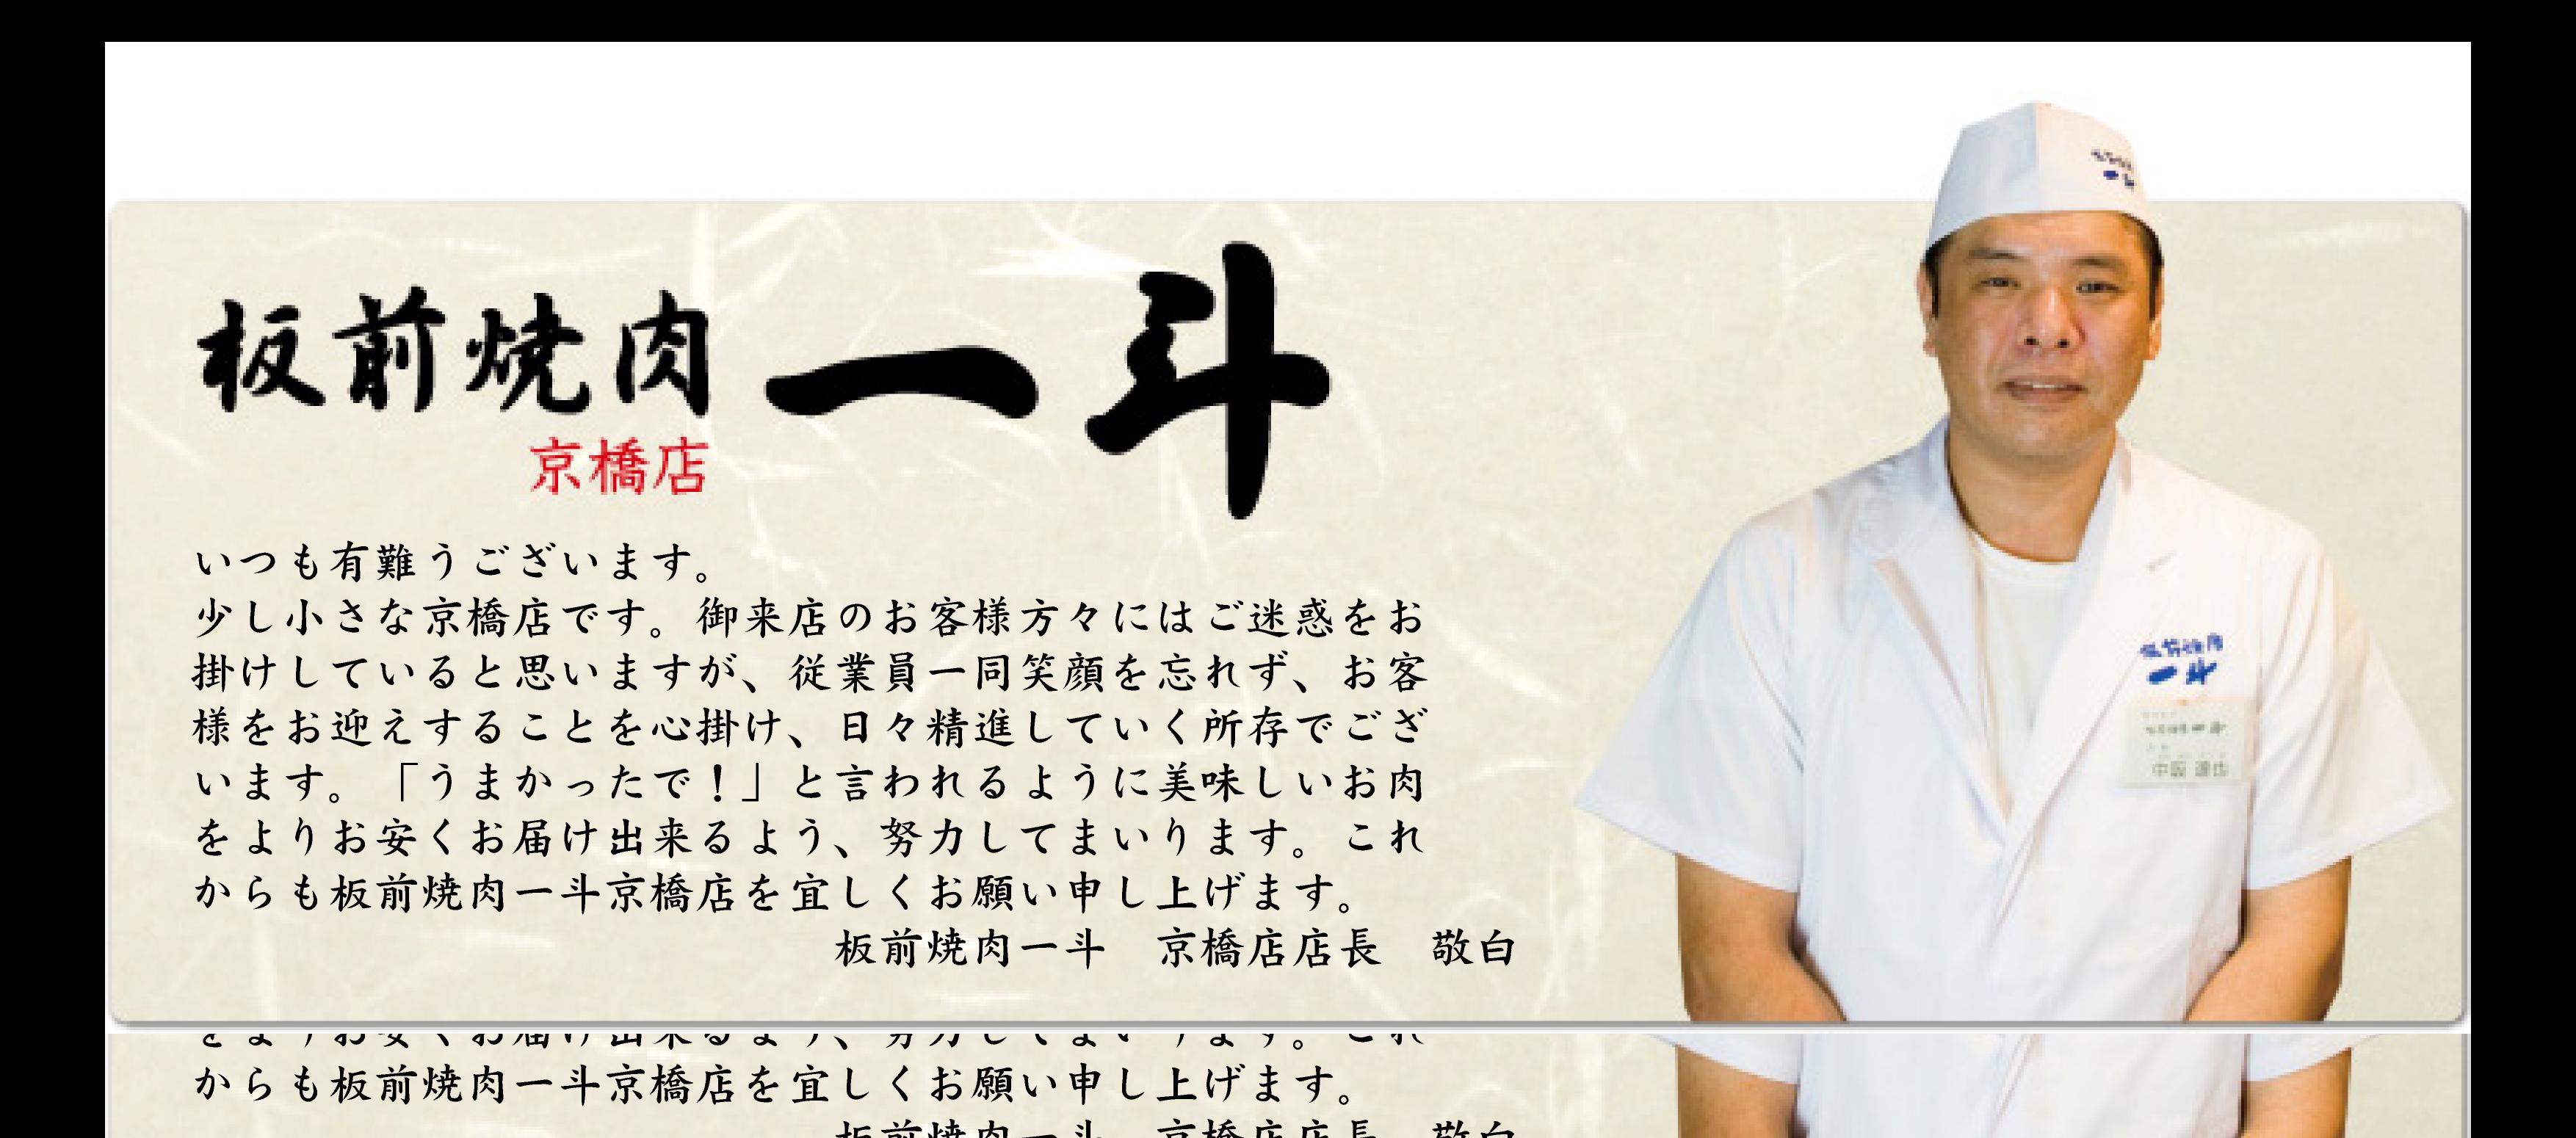 bg_master京橋3月10日-02